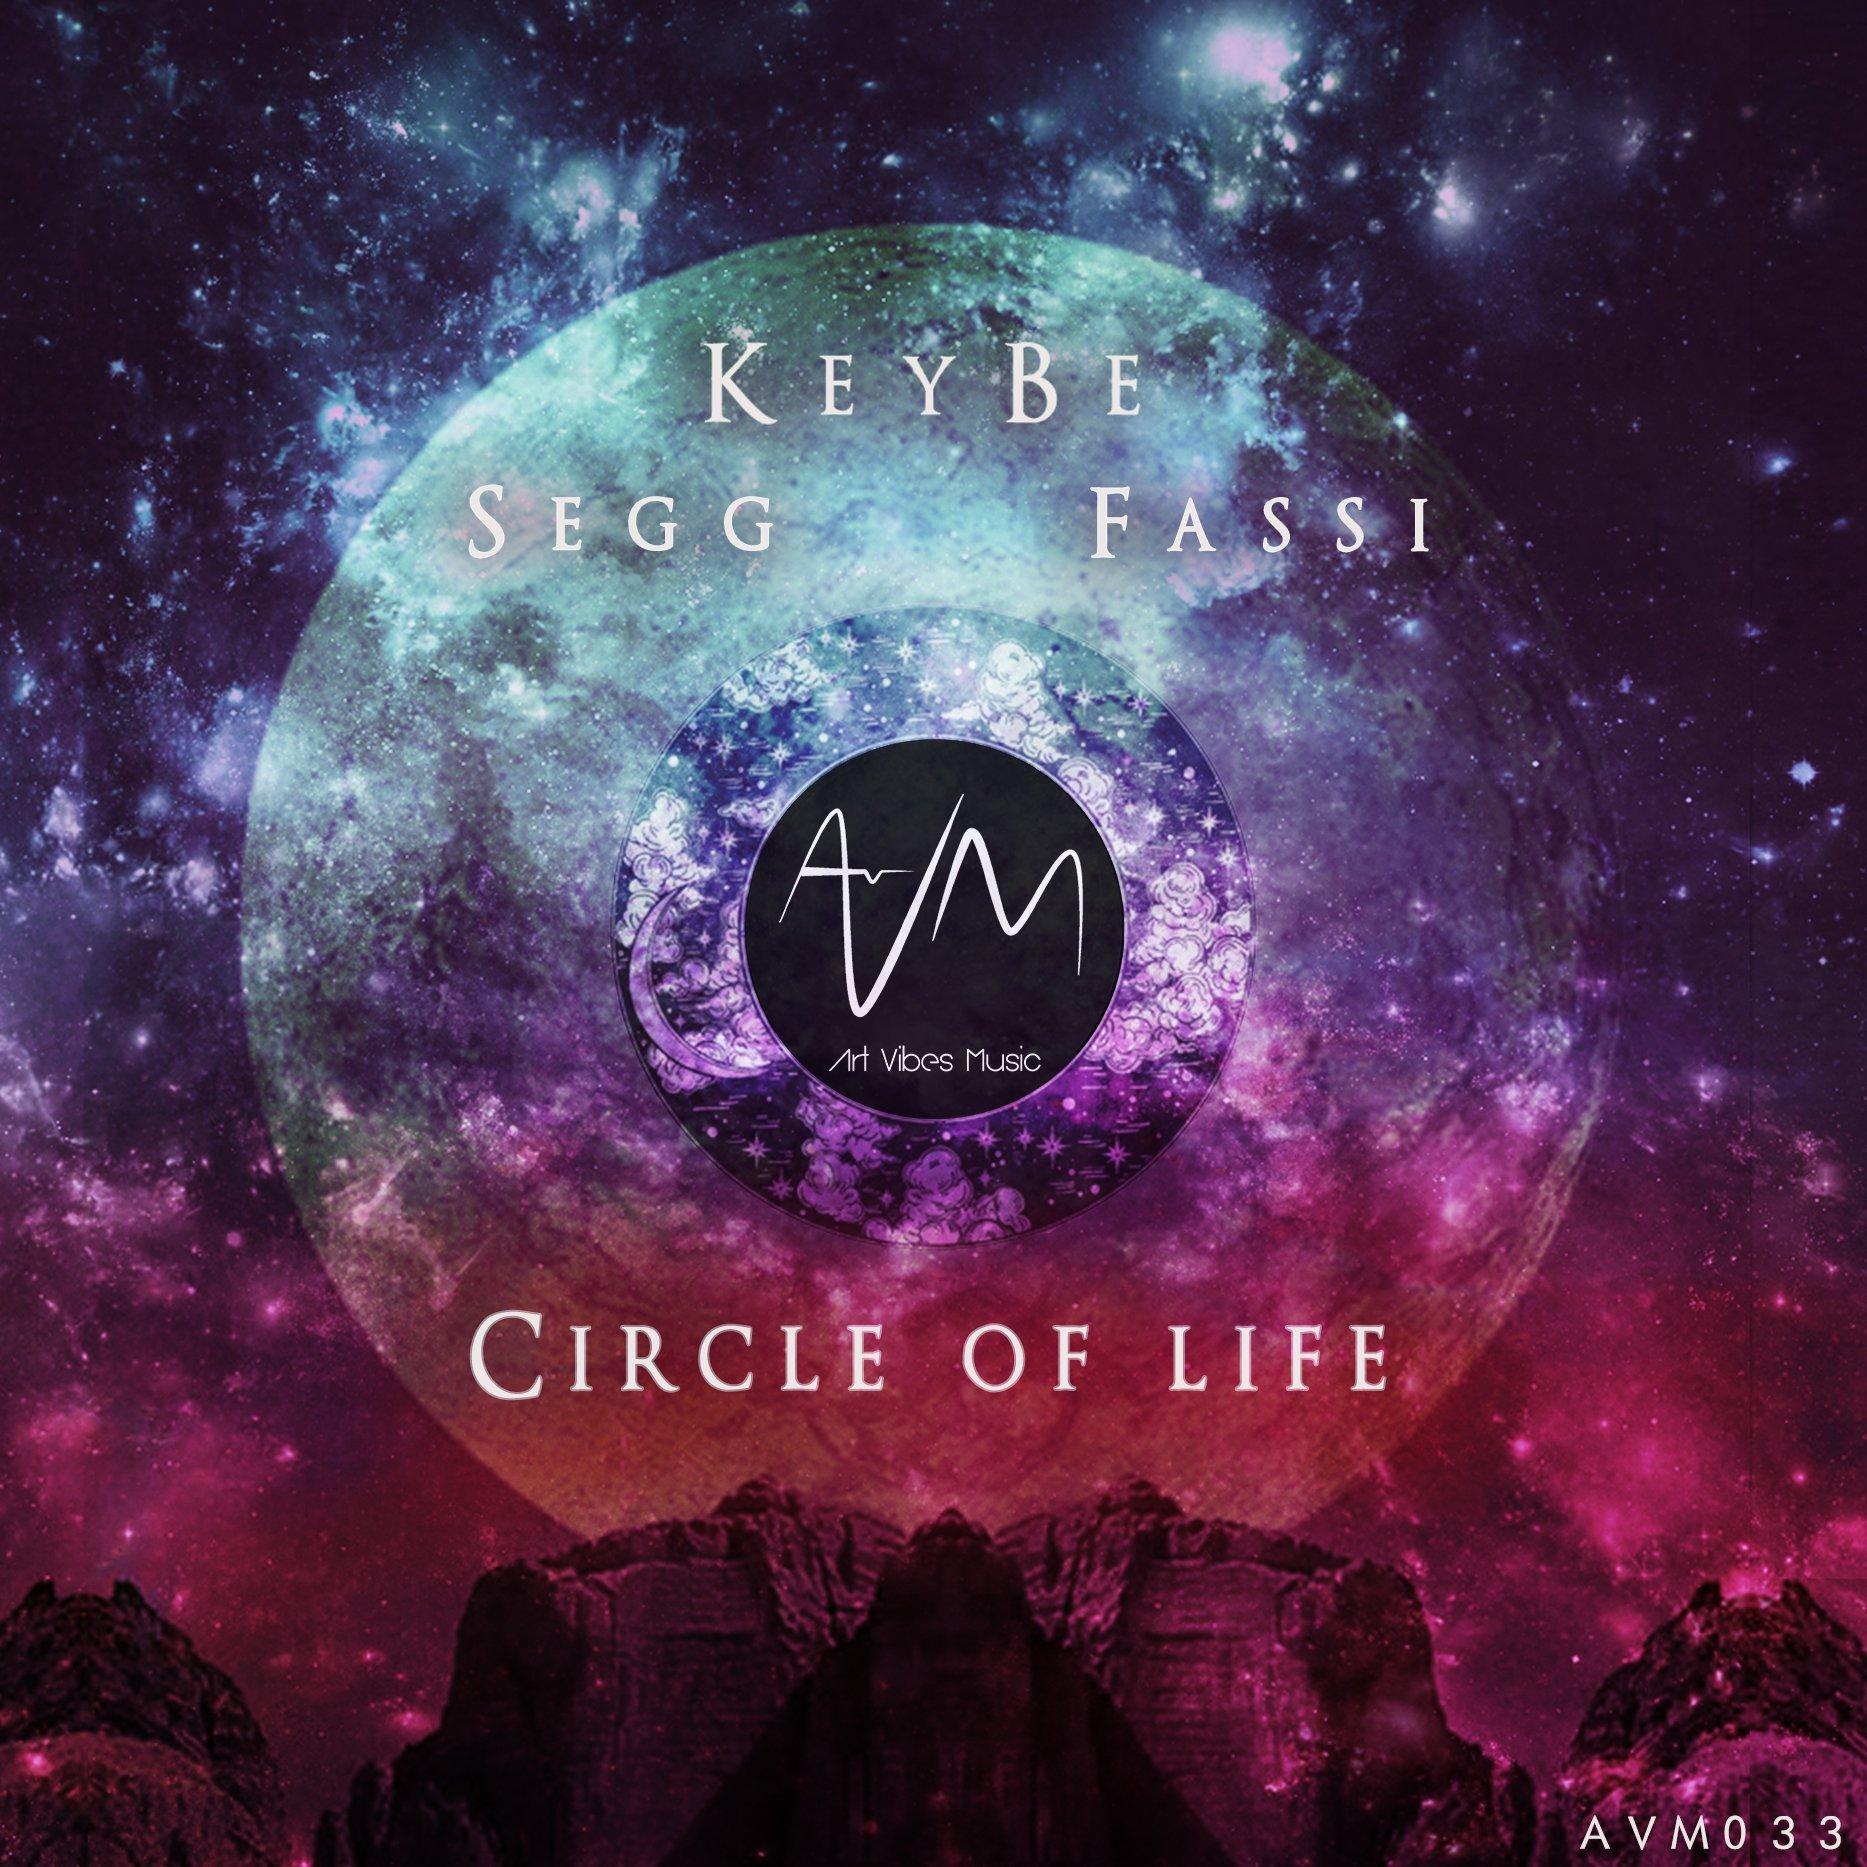 AVM033 - Circle Of Life